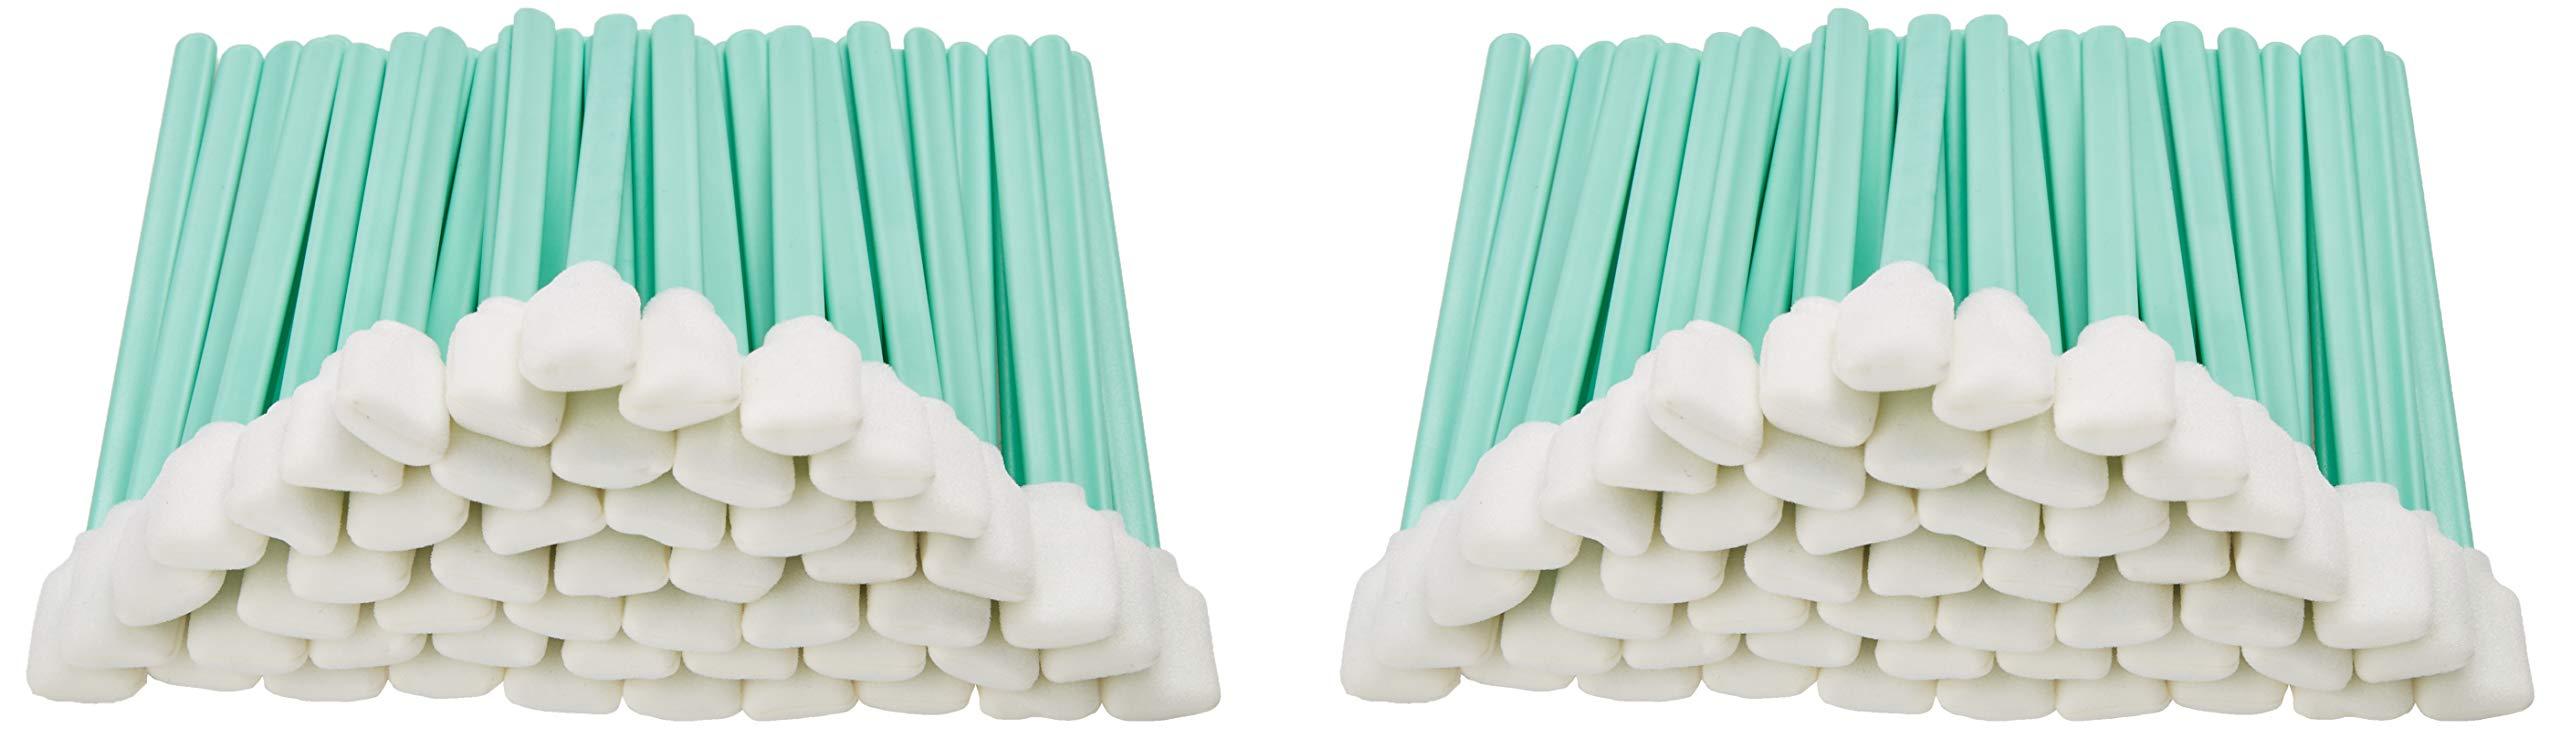 Zetek 5'' Long 100 pcs Foam Tip Cleaning Swabs Sponge Stick for Inkjet Print head Optical Lens Gun Cleaning Solvent Resistance by Zetek Digital